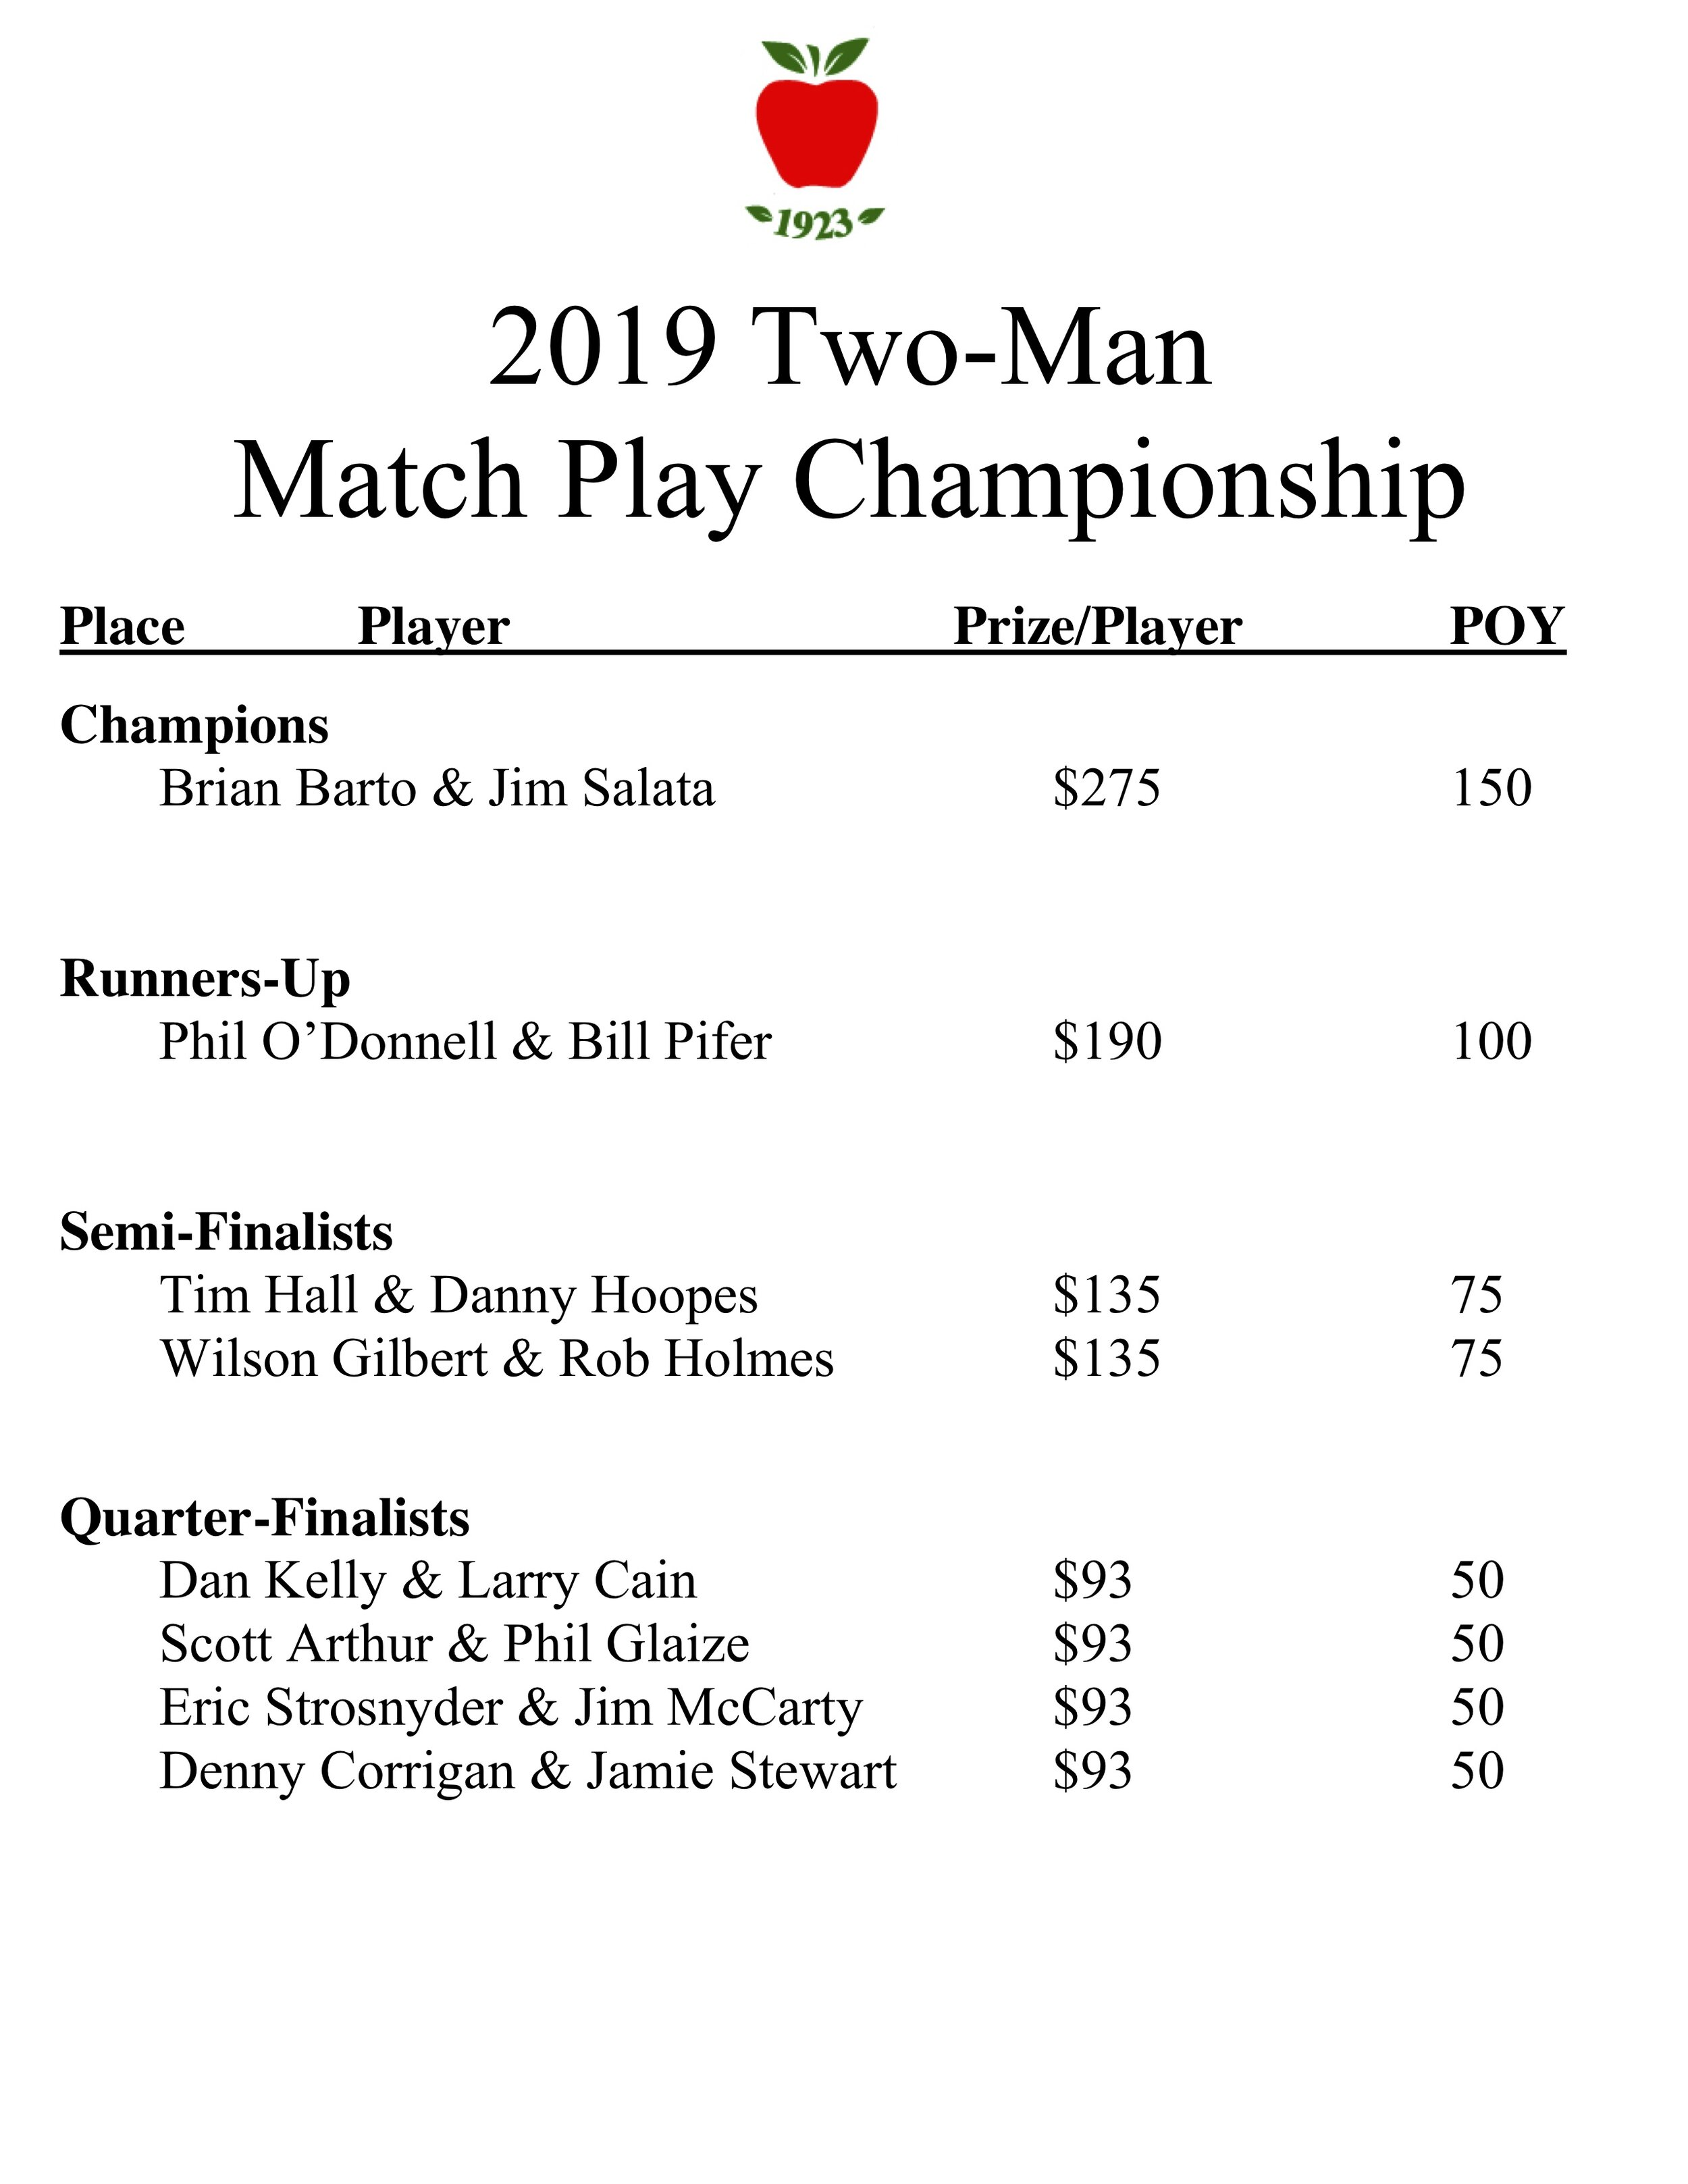 2019 two man match play championship results.jpg